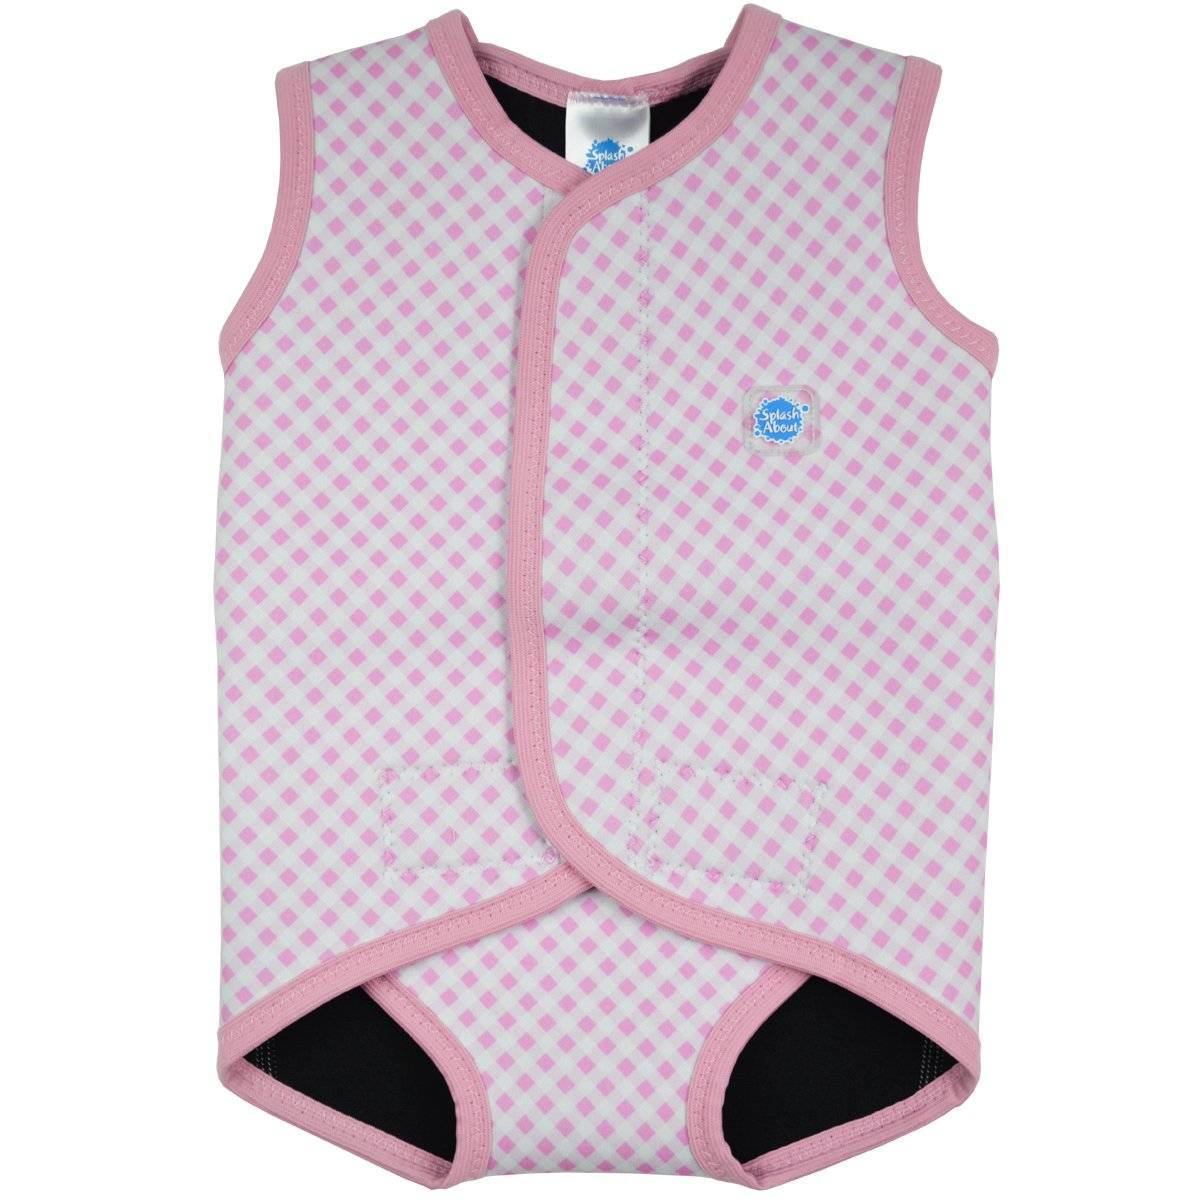 Splash About, Costume da bagno in neoprene per neonati, Rosa (Pink Gingham), 18-30 mesi